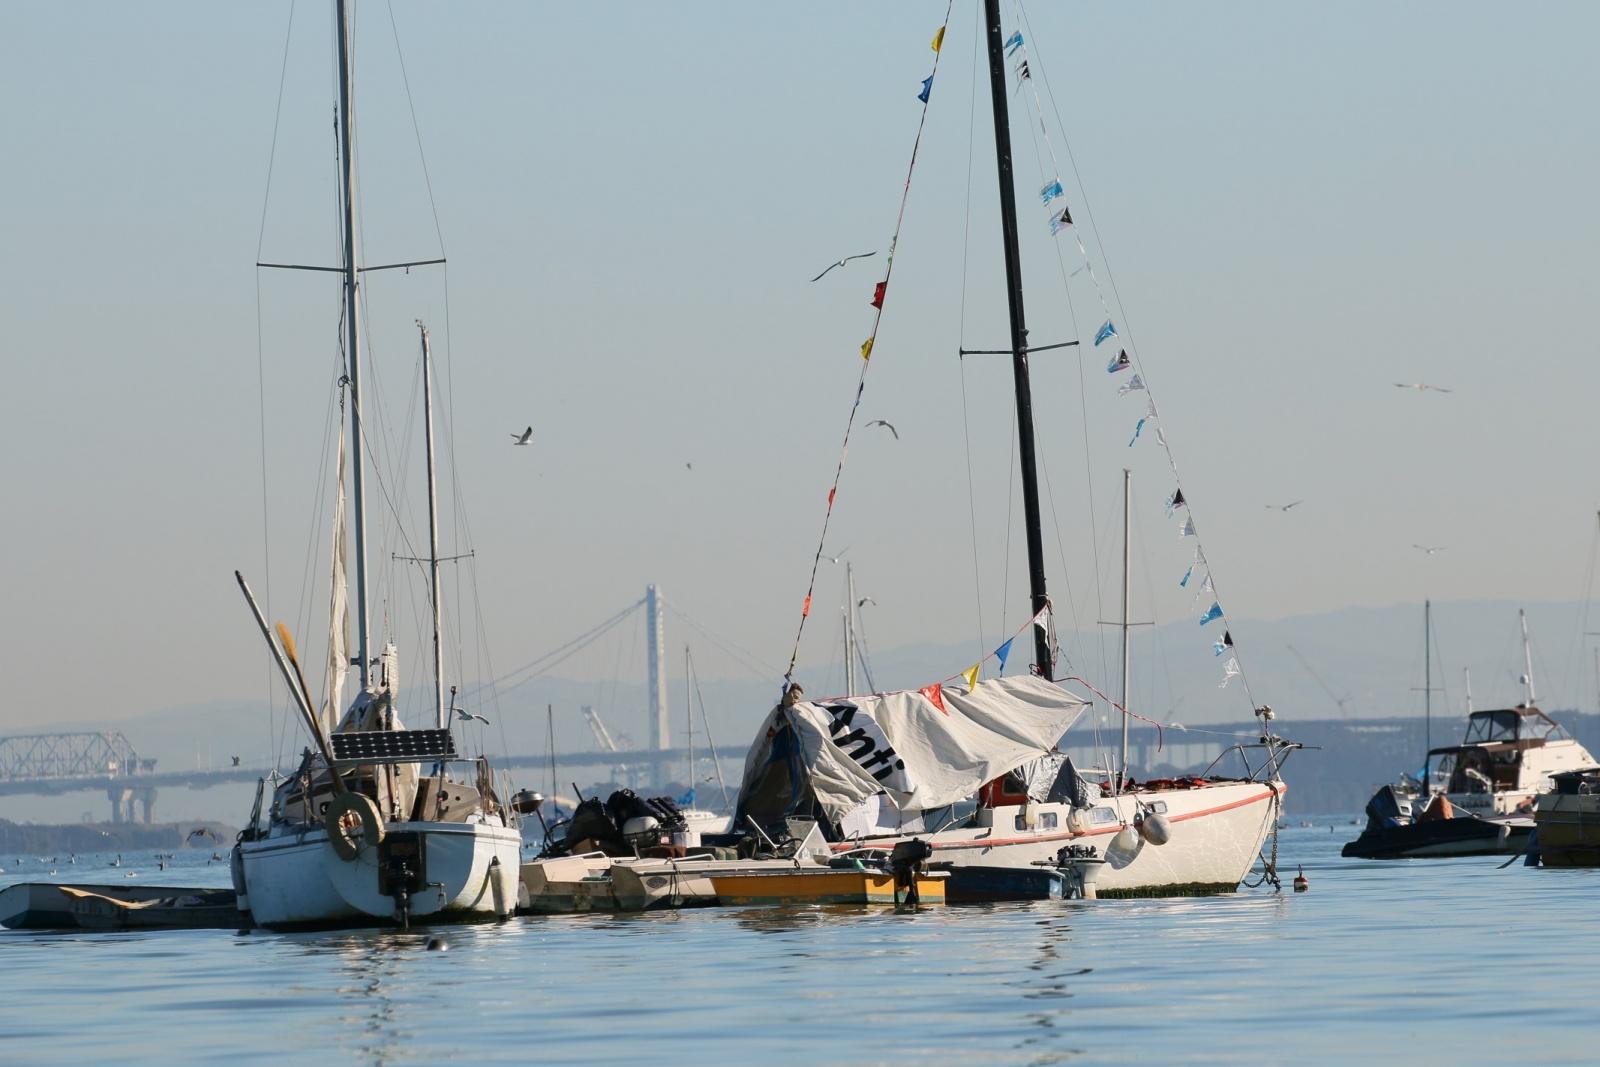 Click image for larger version  Name:Richardson Bay 123115 10.jpg Views:51 Size:335.2 KB ID:116510